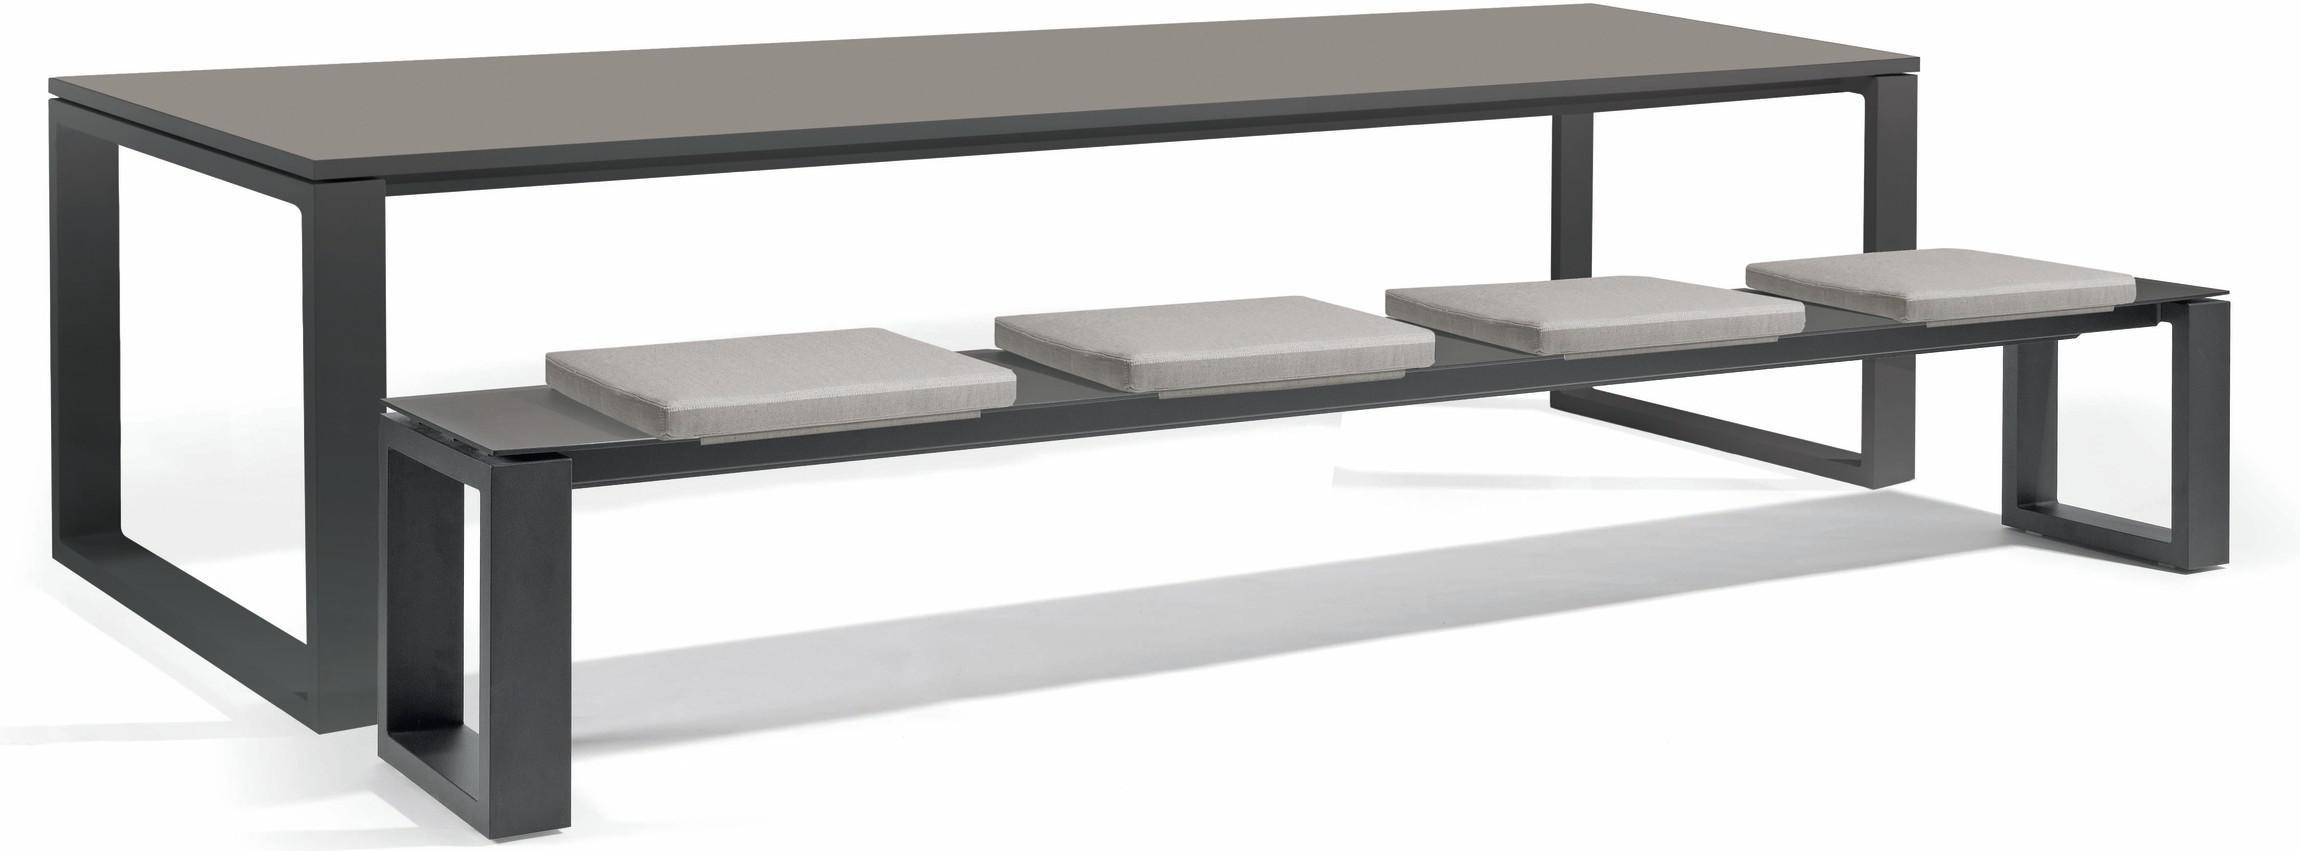 Fuse bench 300 - lava